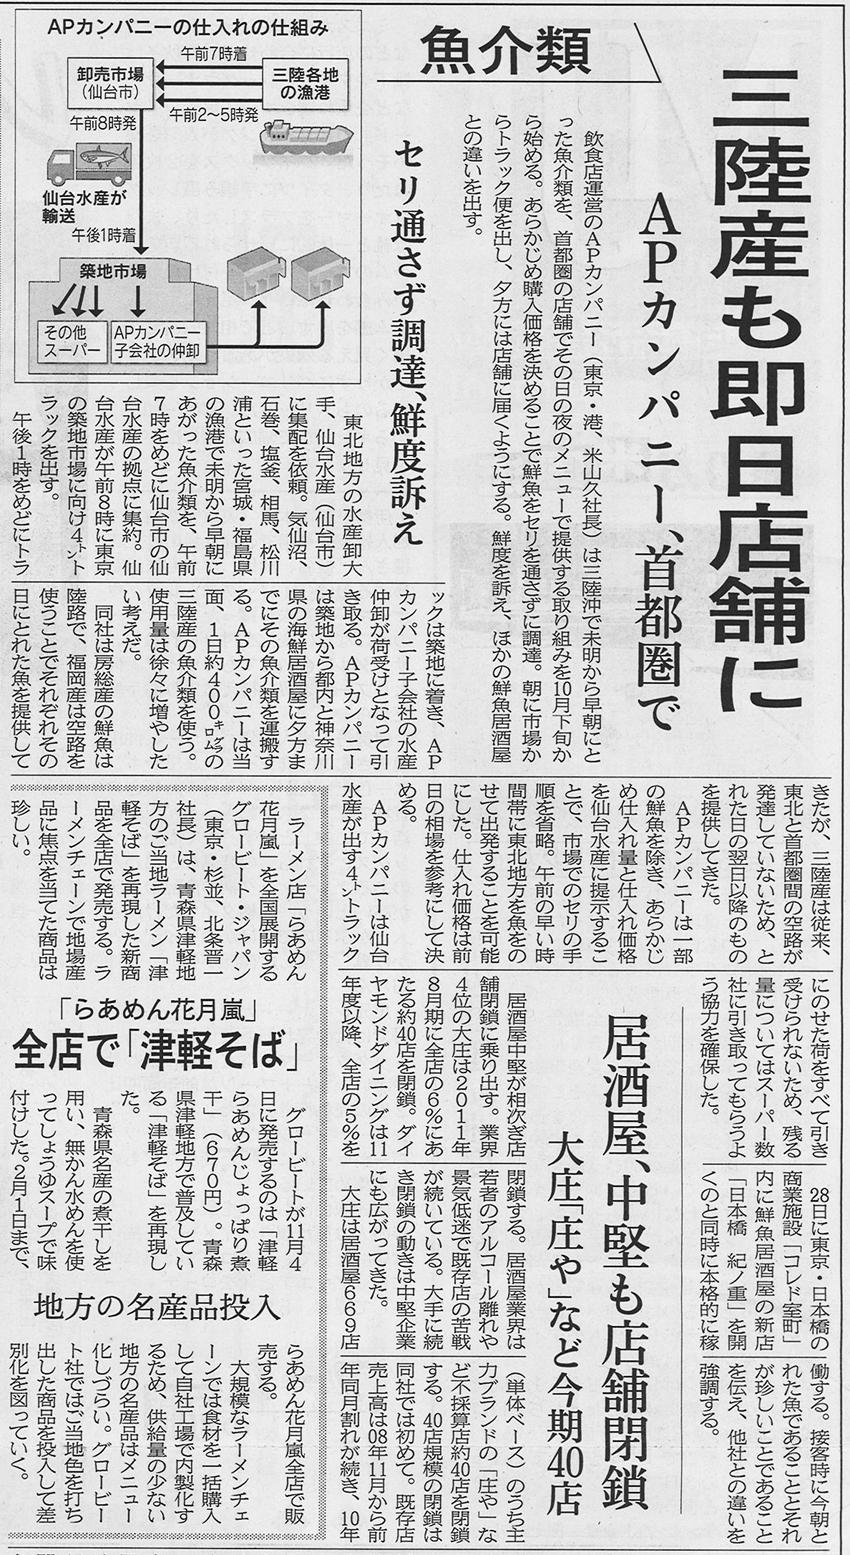 http://apcompany.jp/media/pic/%E6%97%A5%E7%B5%8C.jpg